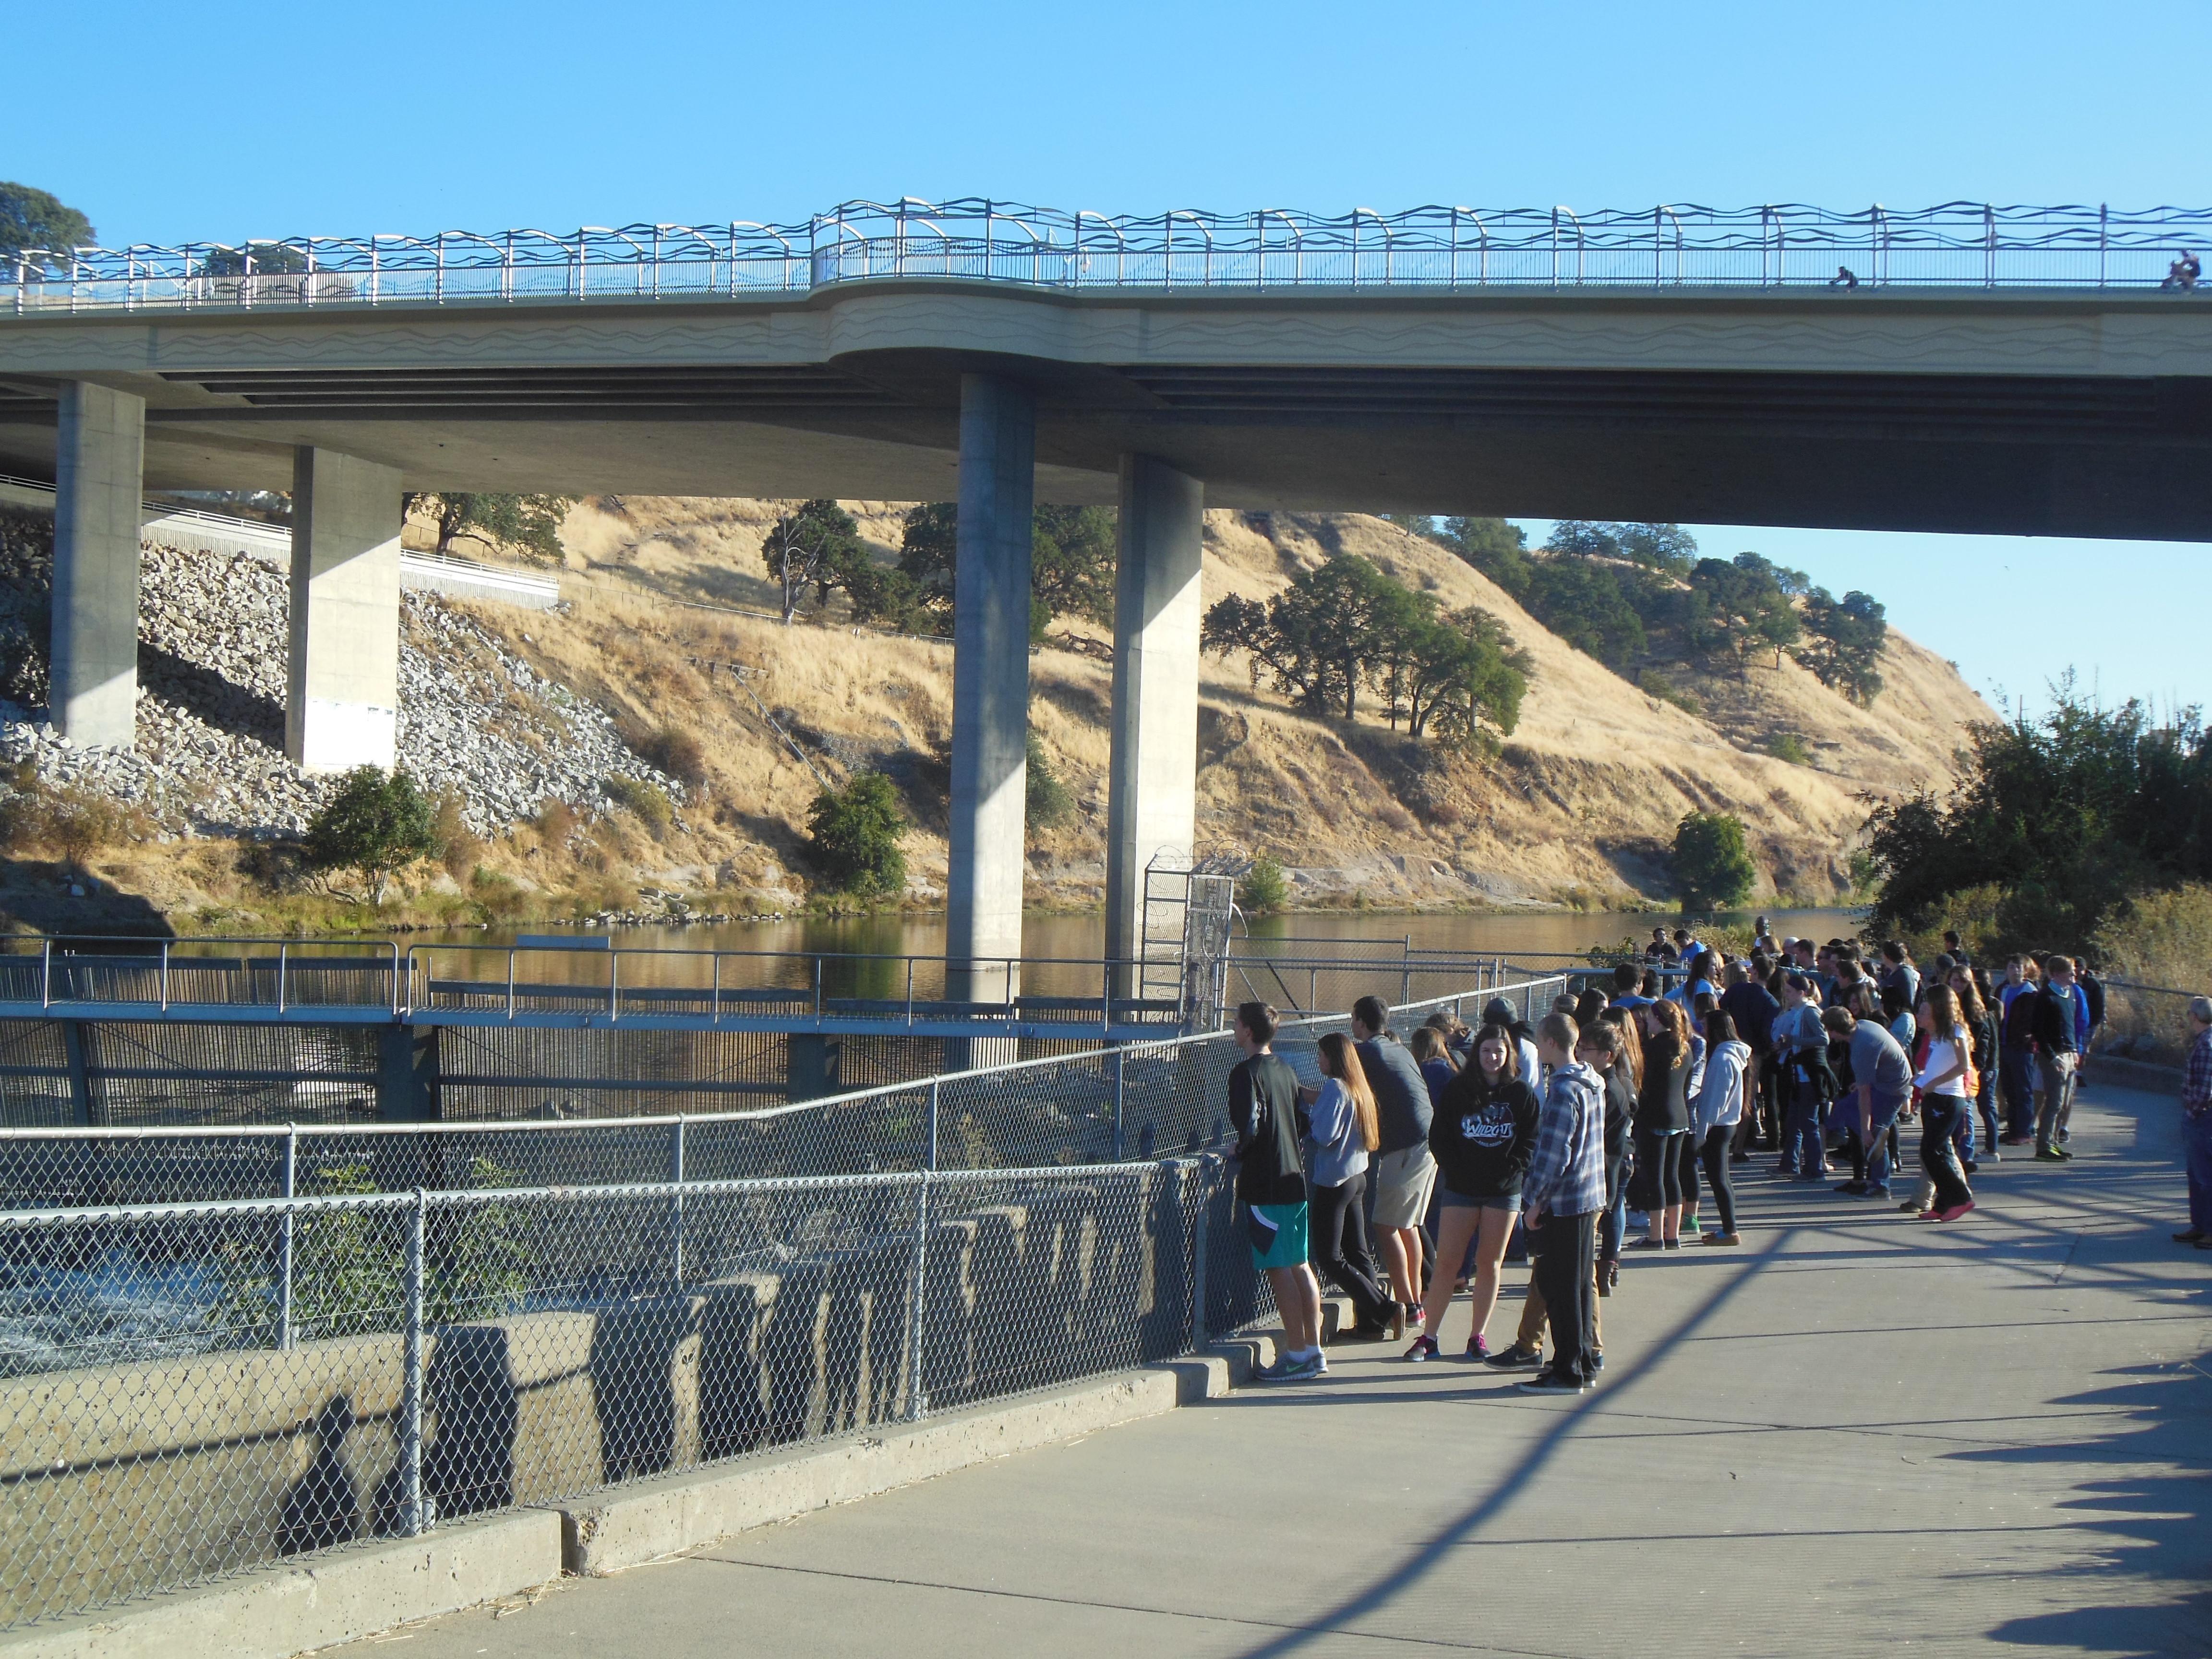 Environmental science field trip goes swimmingly blue for Nimbus dam fishing